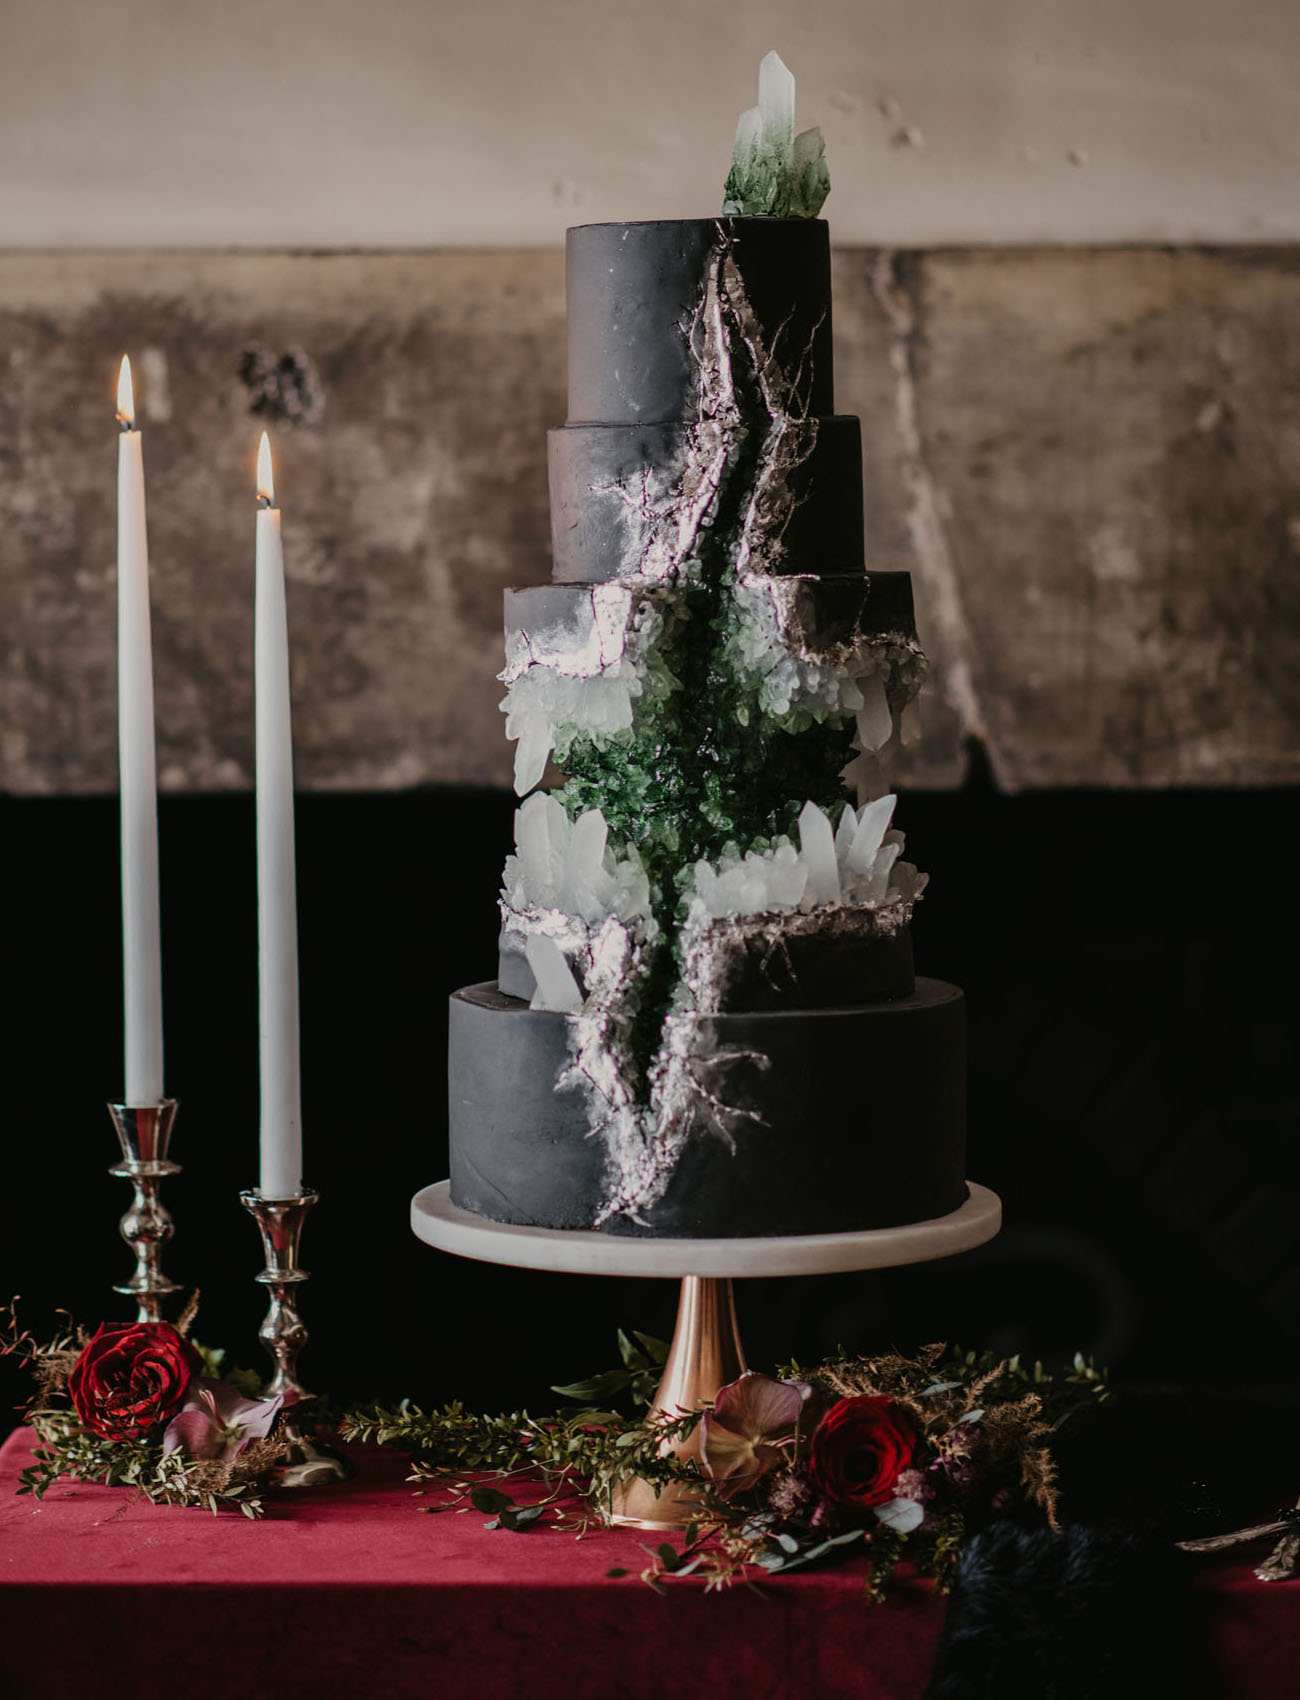 Geode Wedding Cake.Picture Of Gorgeous Geode Wedding Cake